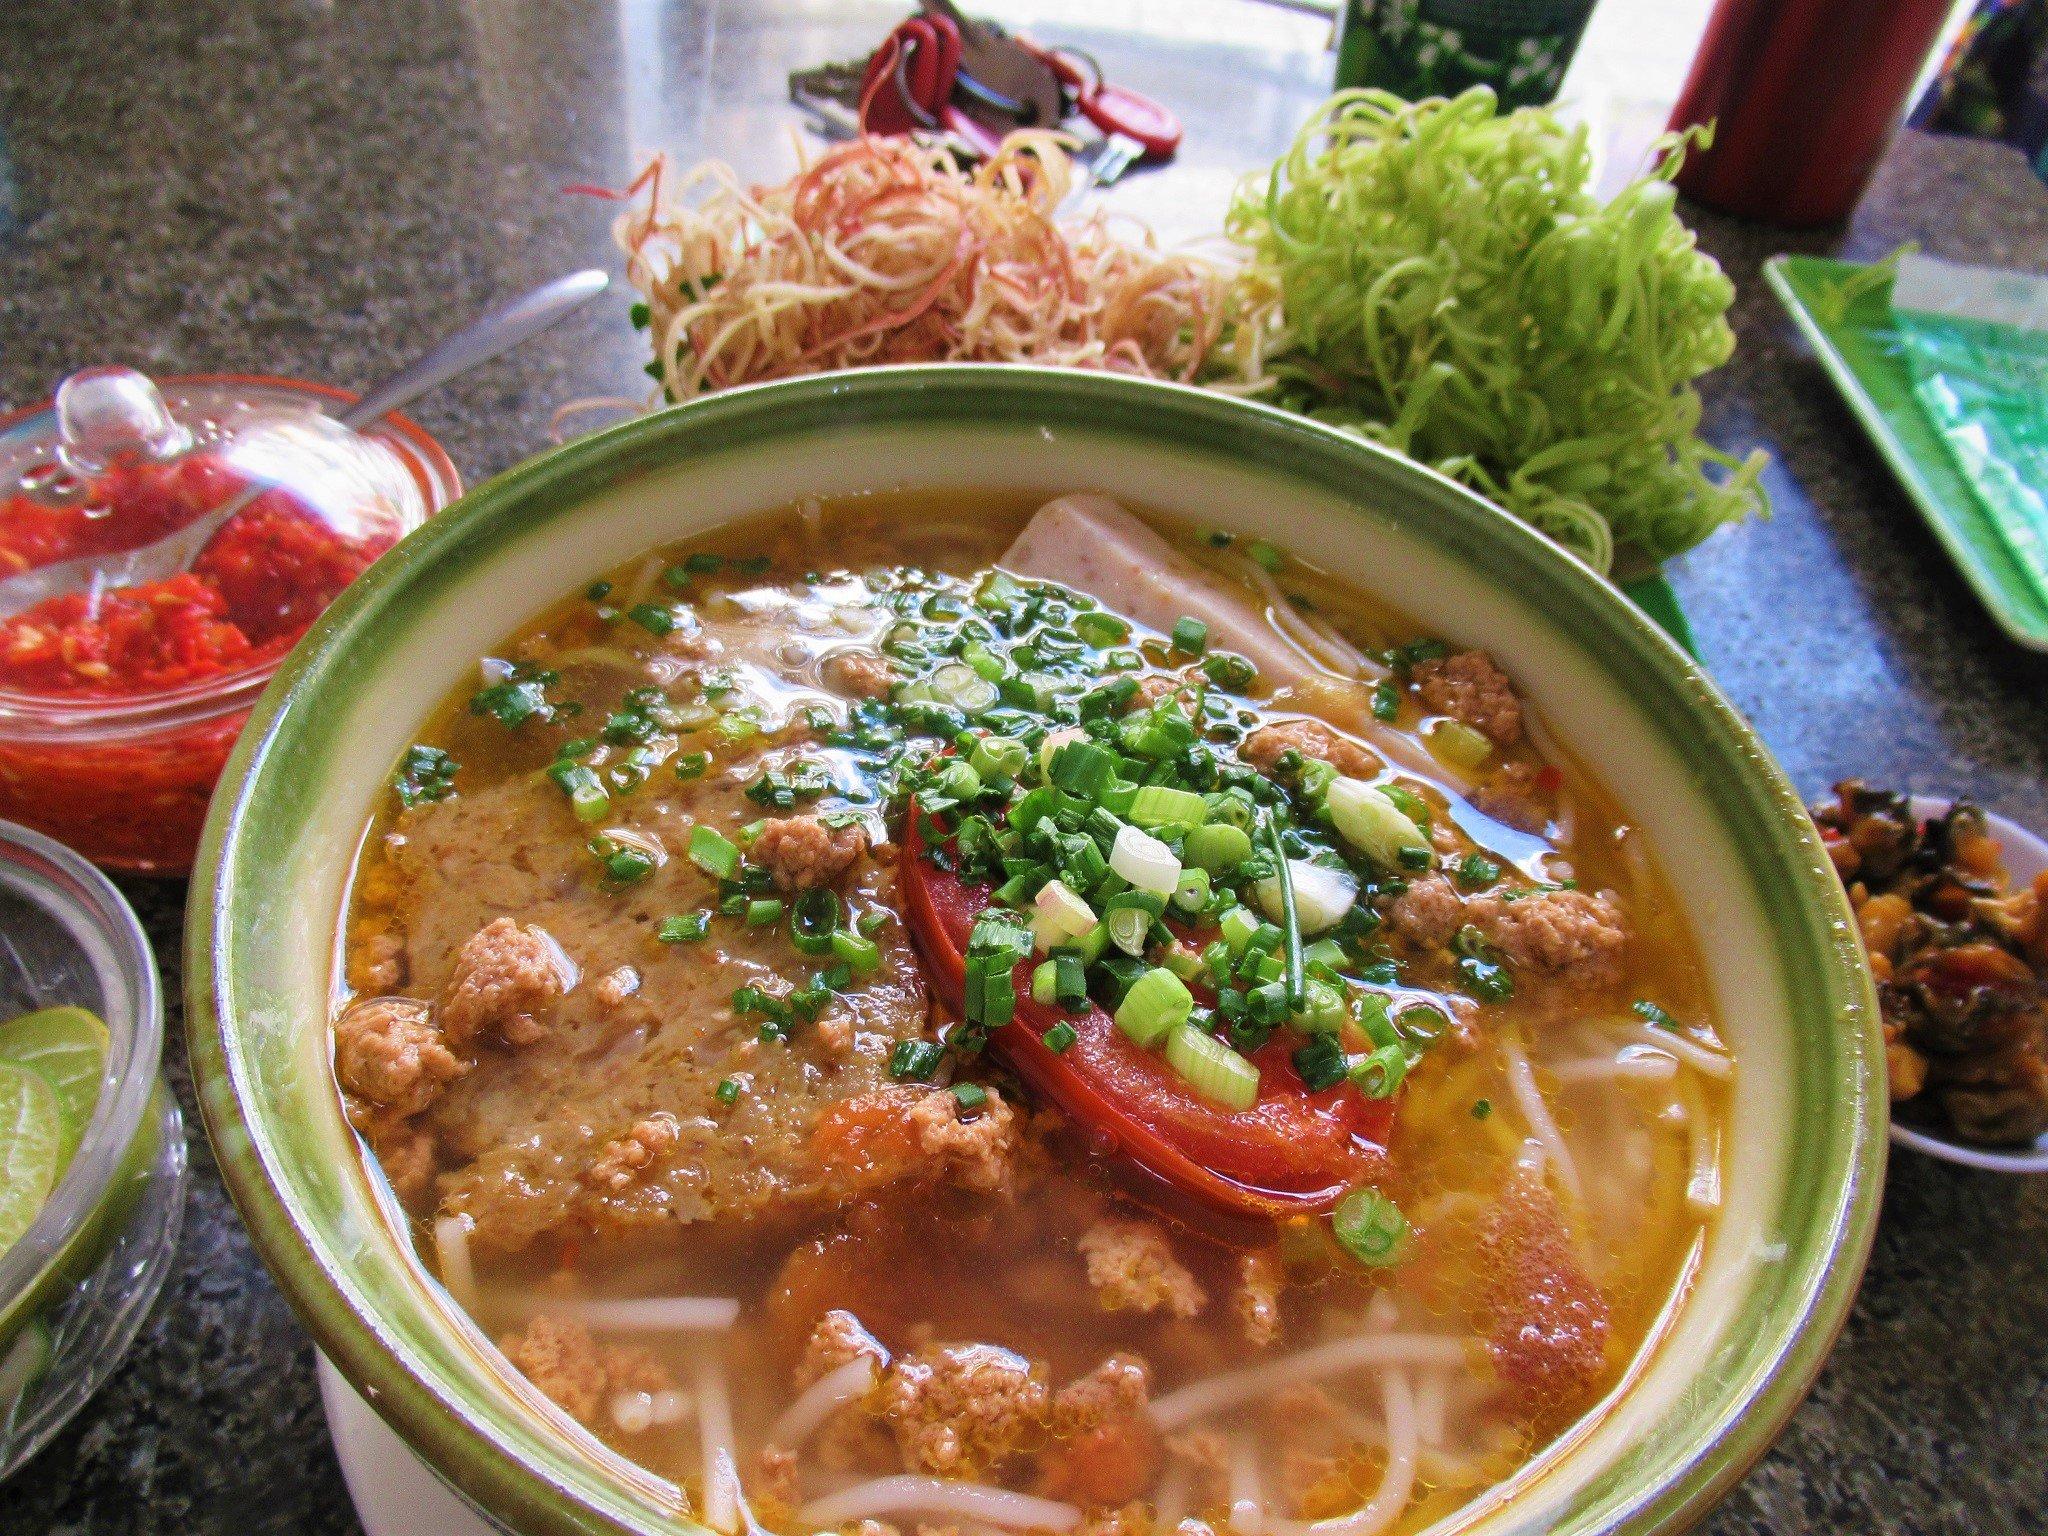 Bún Riêu Cua Ốc: crab & snail noodle soup, Saigon, Ho Chi Minh City, Vietnam